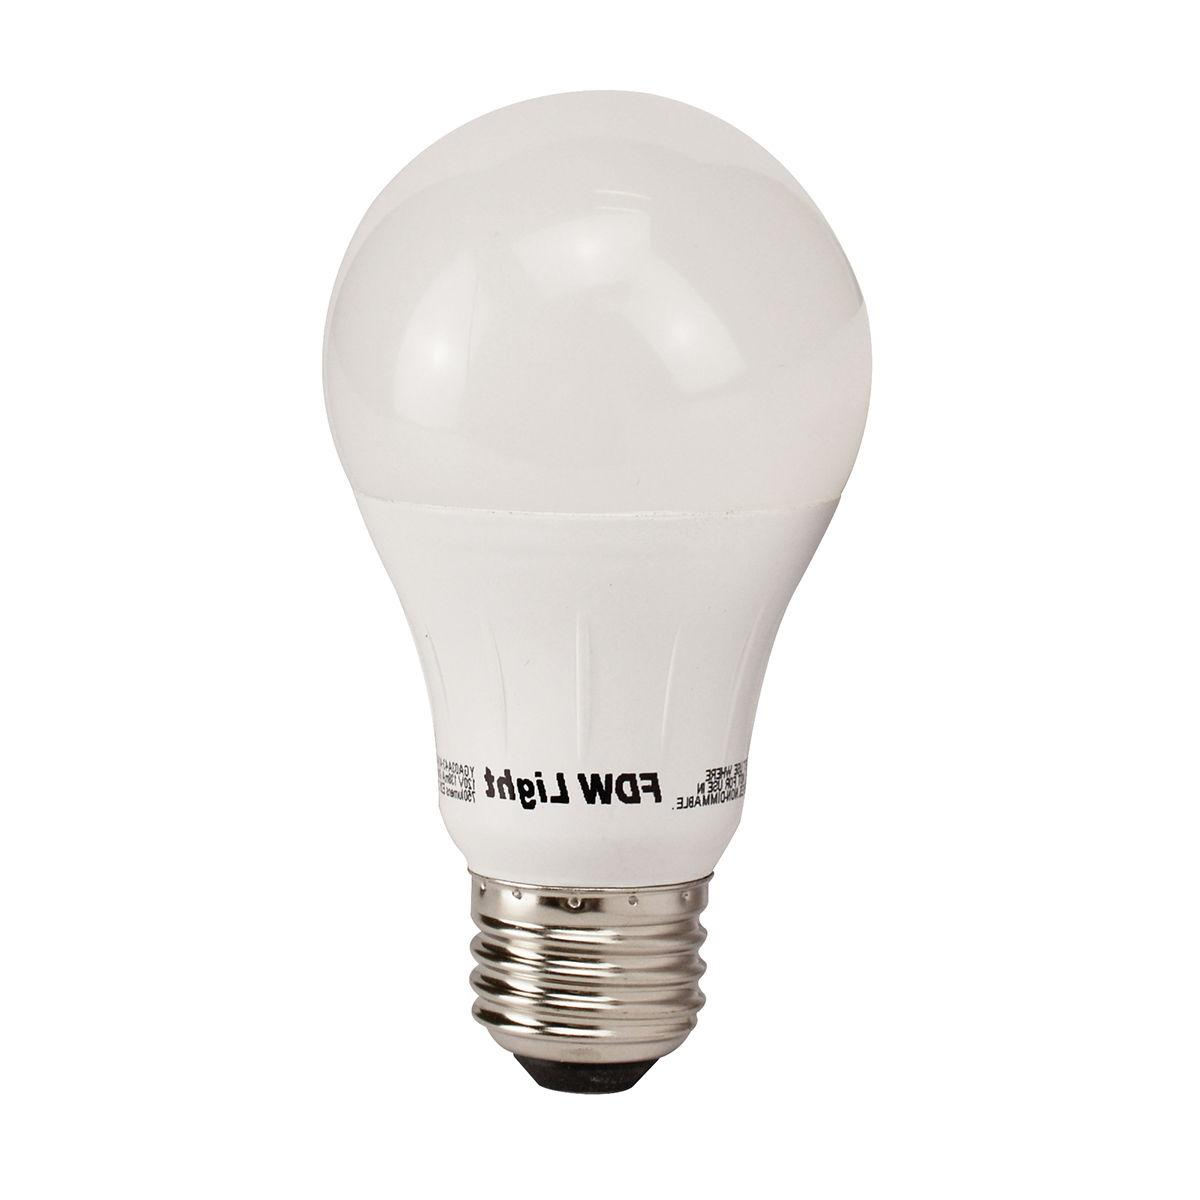 New 60 Watt SlimStyle Bulb White 12